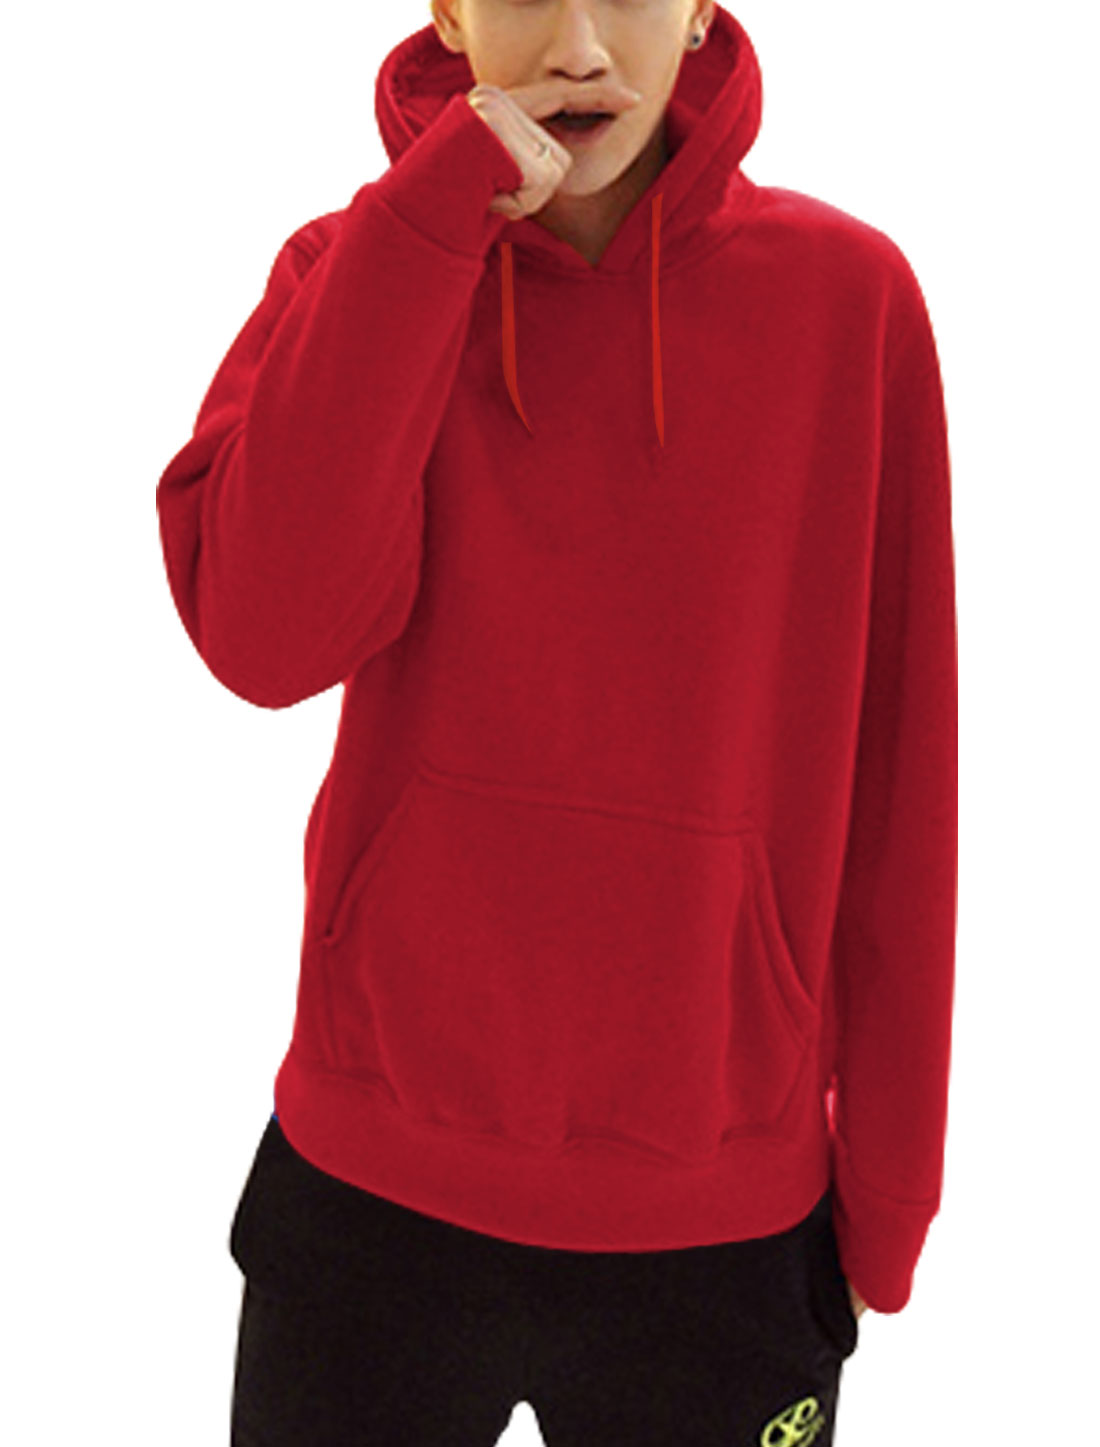 Men Drawcord Design Kangaroo Pcoket Fashion Thick Hooded Sweatshirt Red L